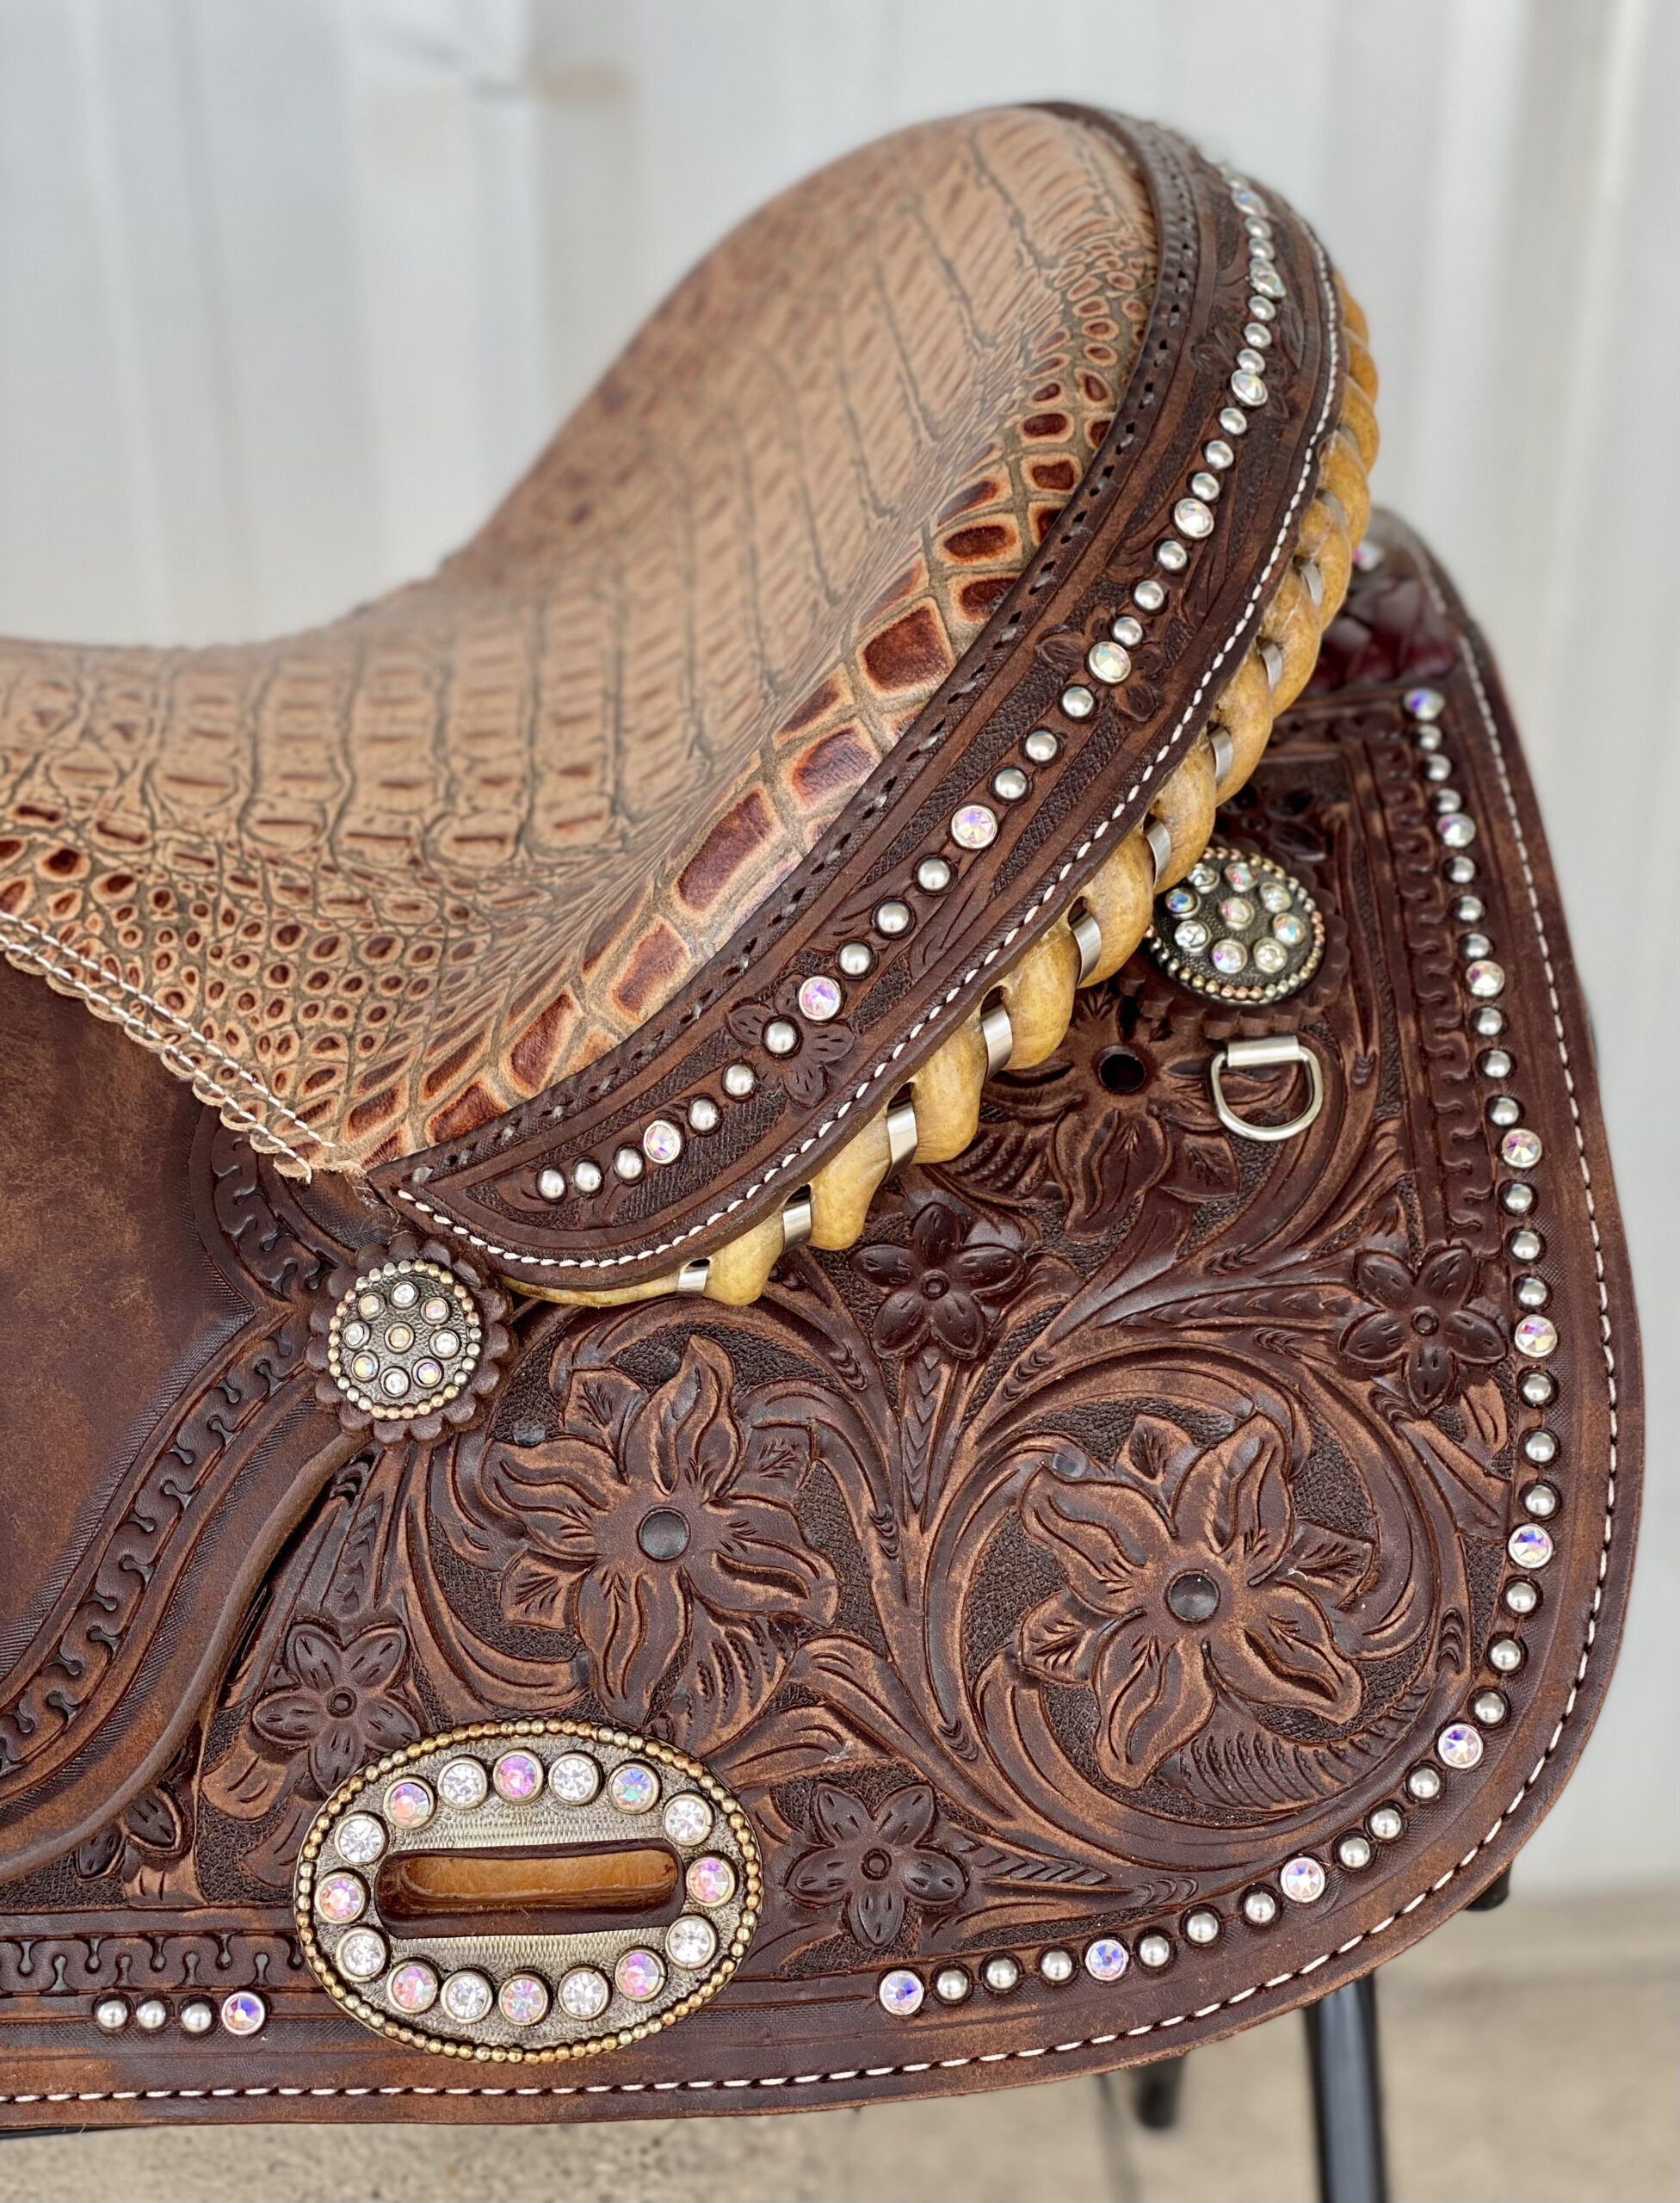 <b>14.5in</b><p>Vintage Glam barrel saddle </B></p>